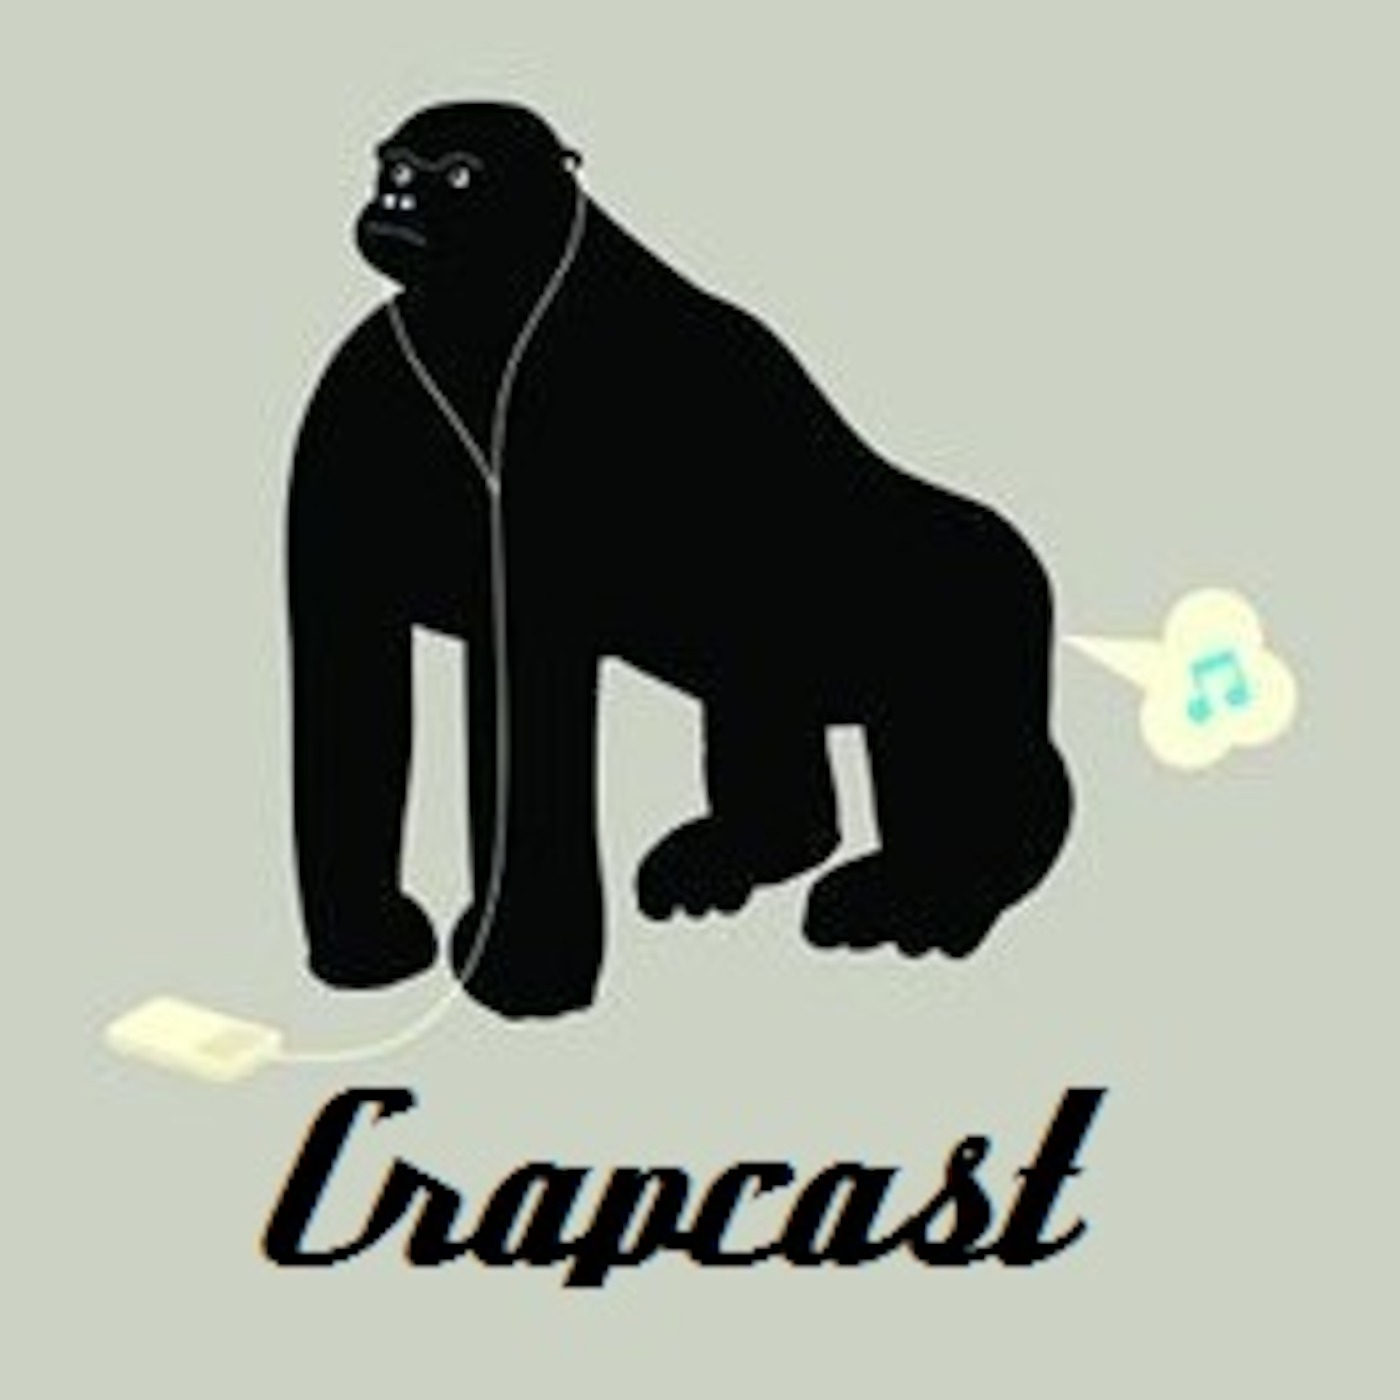 Crapcast!